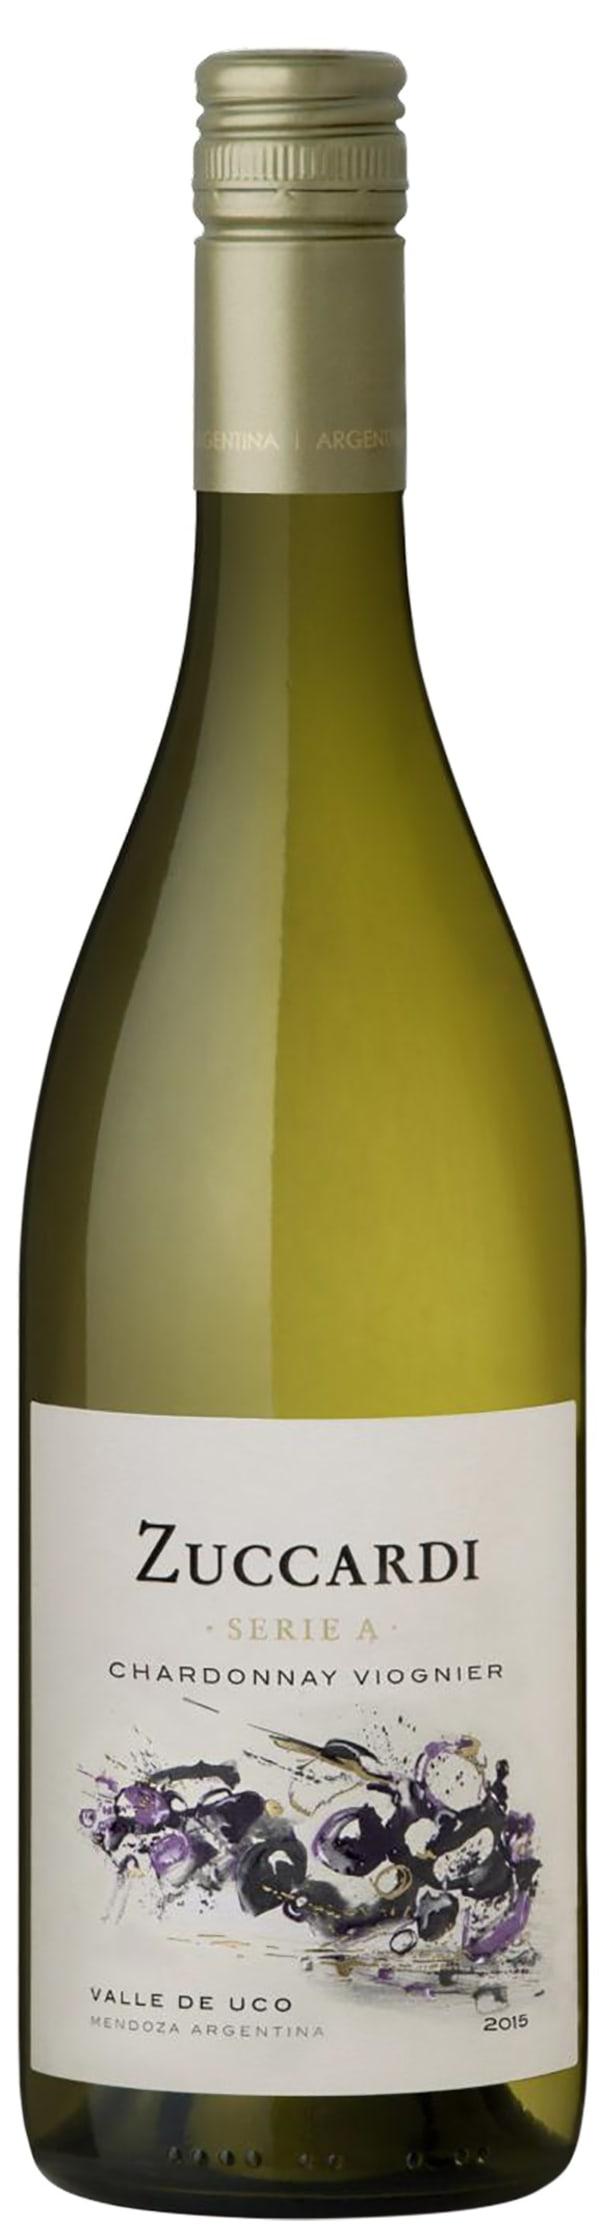 Zuccardi Serie A Chardonnay Viognier 2015